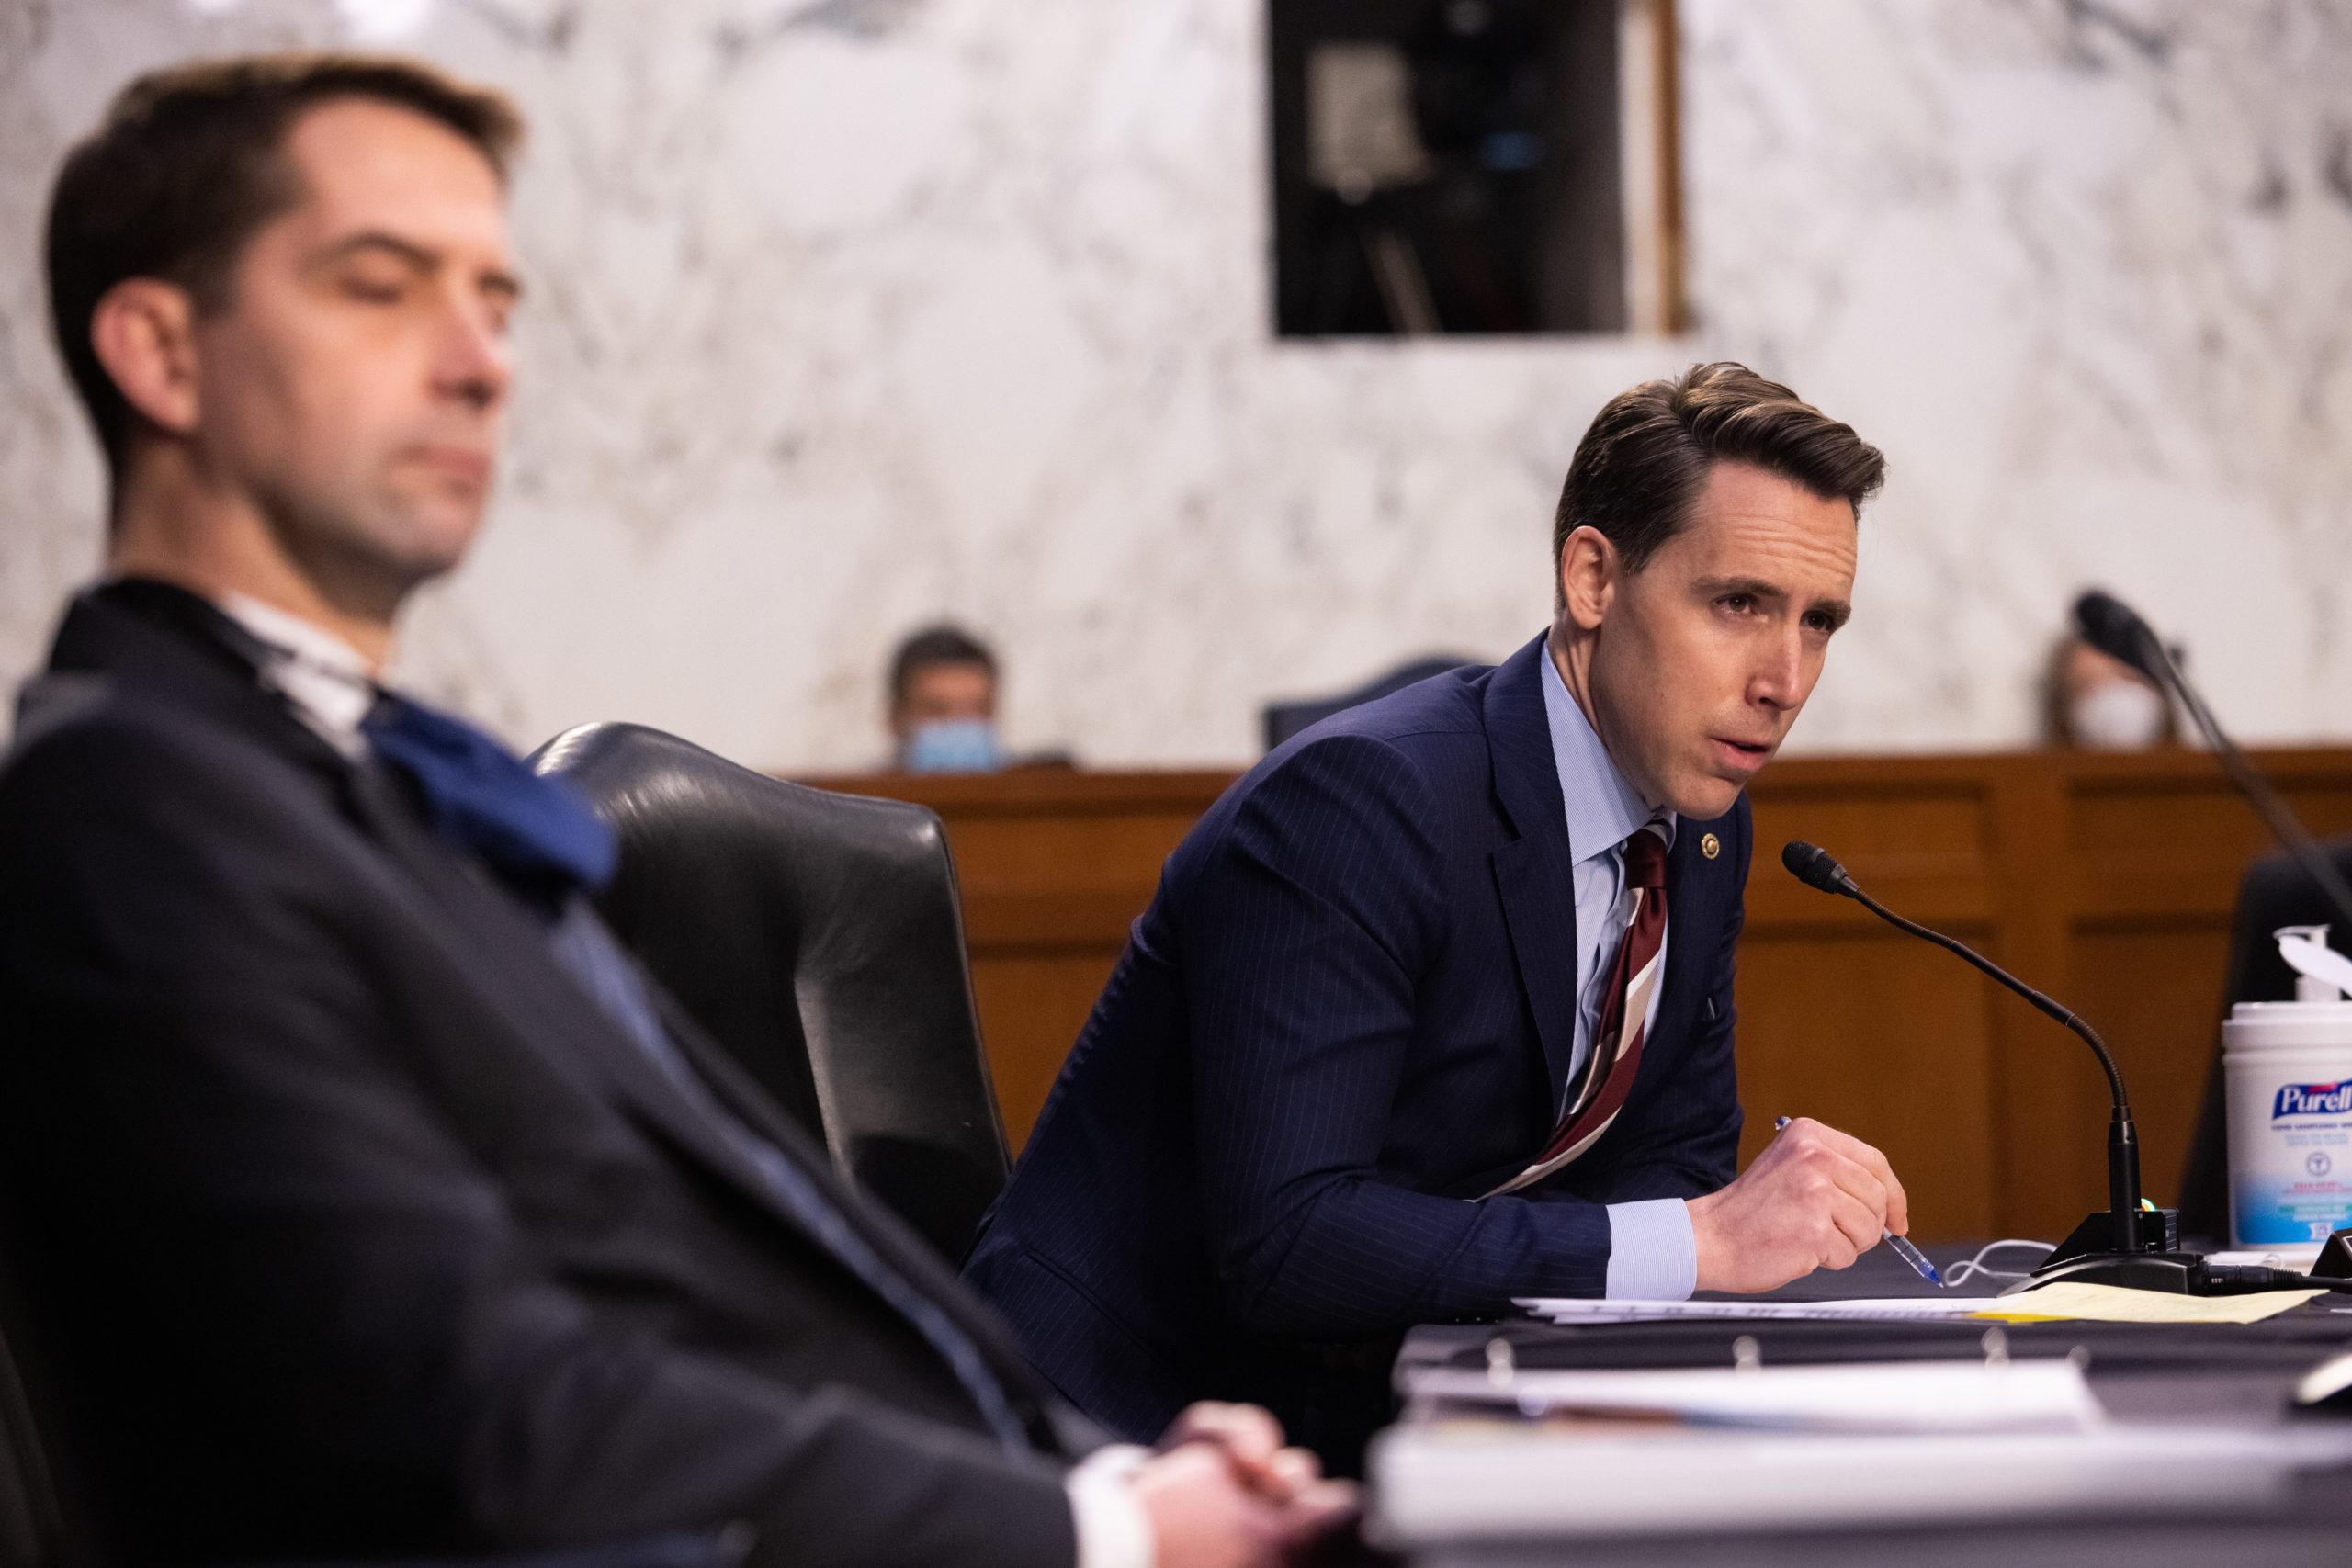 Sen. Josh Hawley speaks during a Senate Judiciary Committee on March 2, 2021. Sen. Tom Cotton looks on. (Graeme Jennings-Pool/Getty Images)